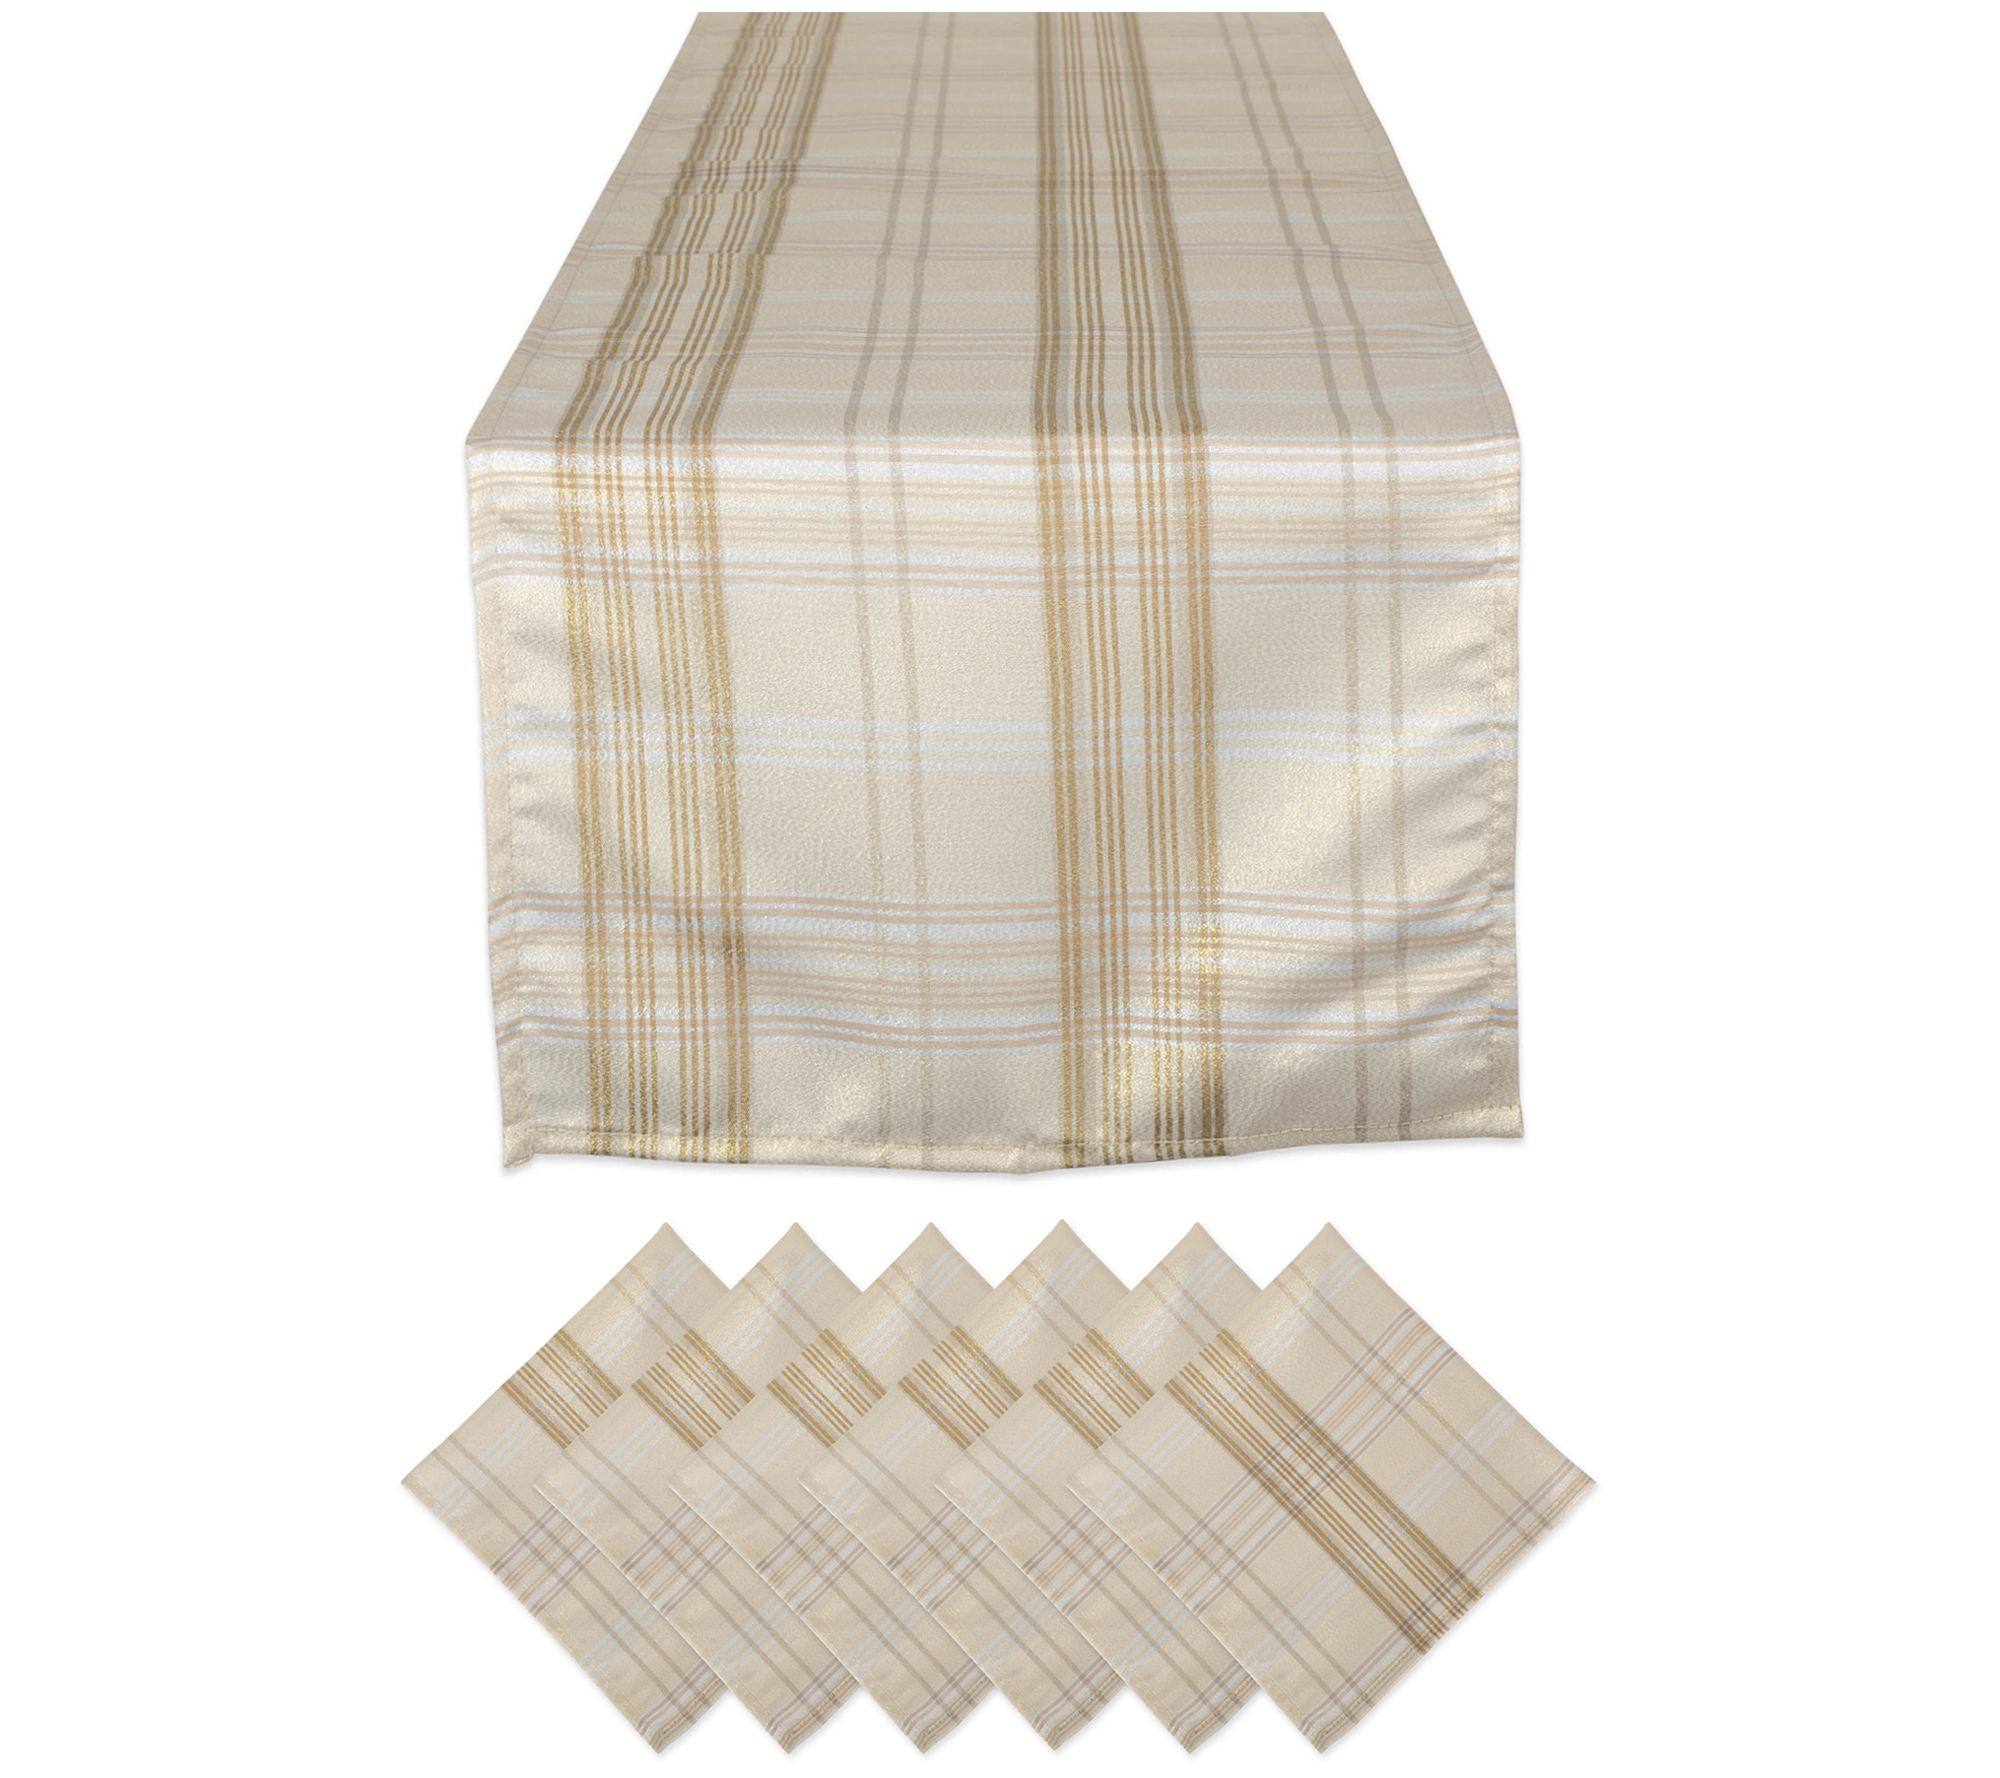 Cream metallic plaid table set